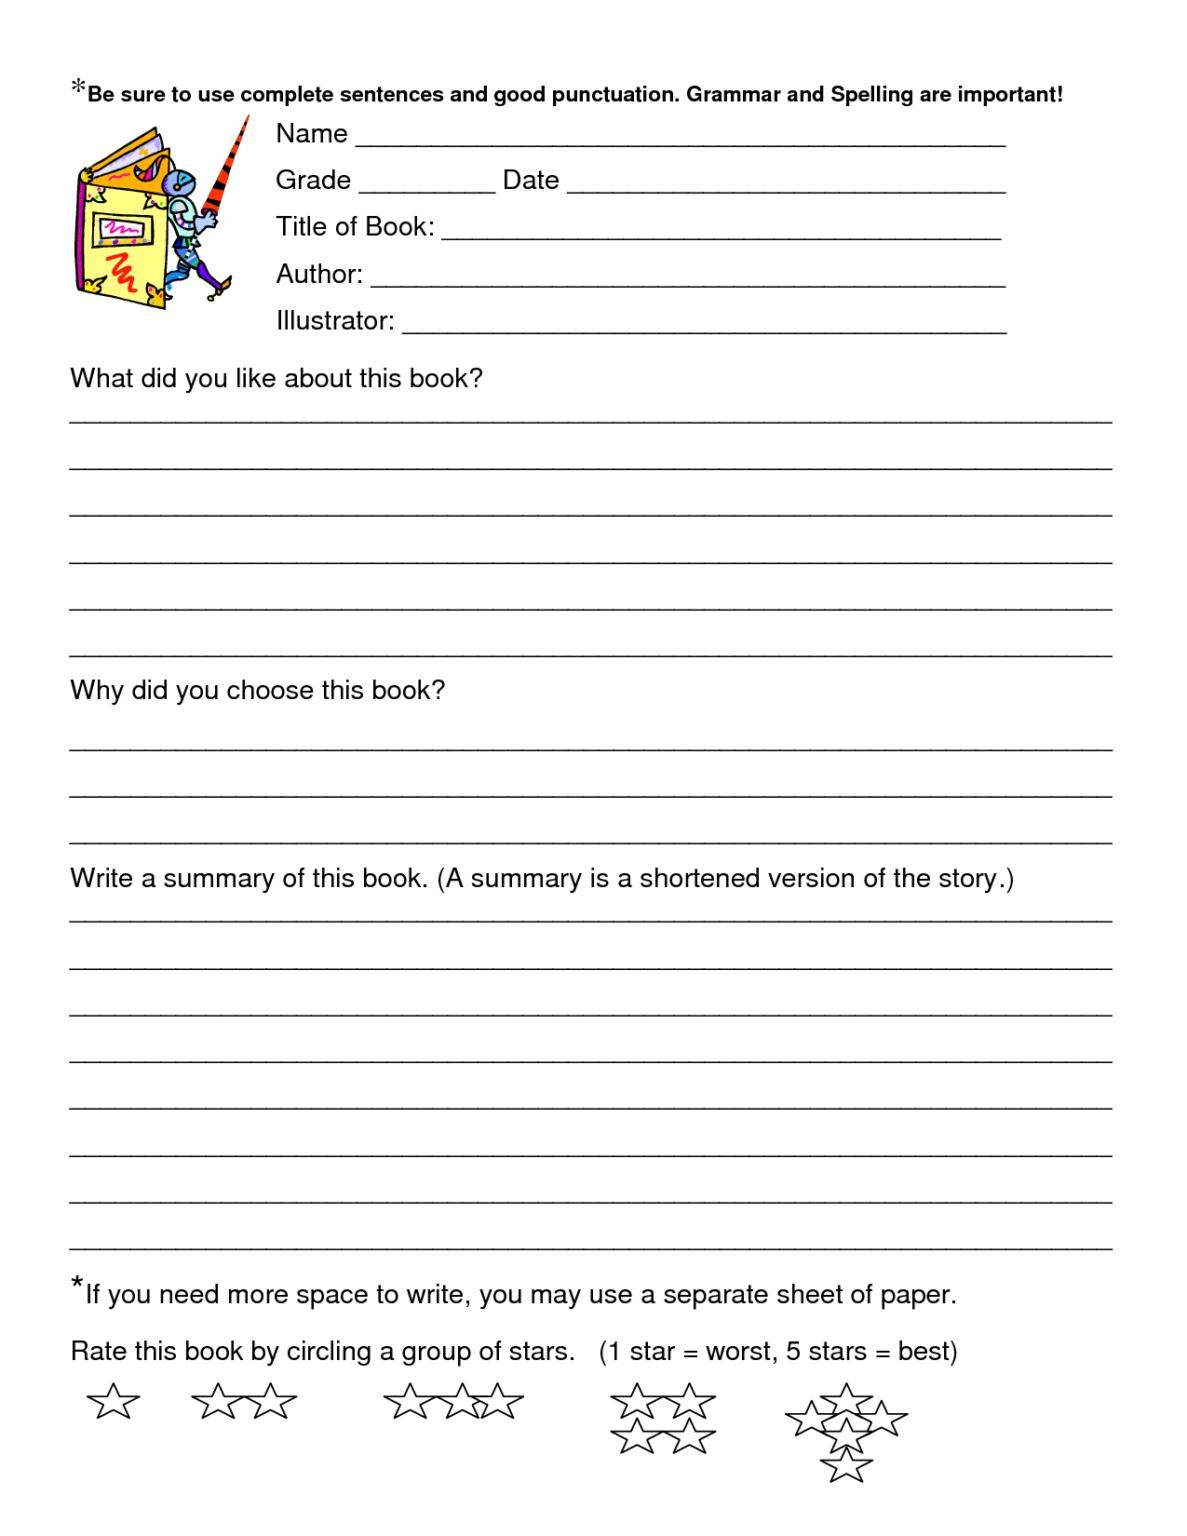 Book Review Worksheet Grade 5 Printable Worksheets And Inside 6th Grade Book Report Template Book Report Templates Biography Book Report Template Grade Book [ 1536 x 1187 Pixel ]